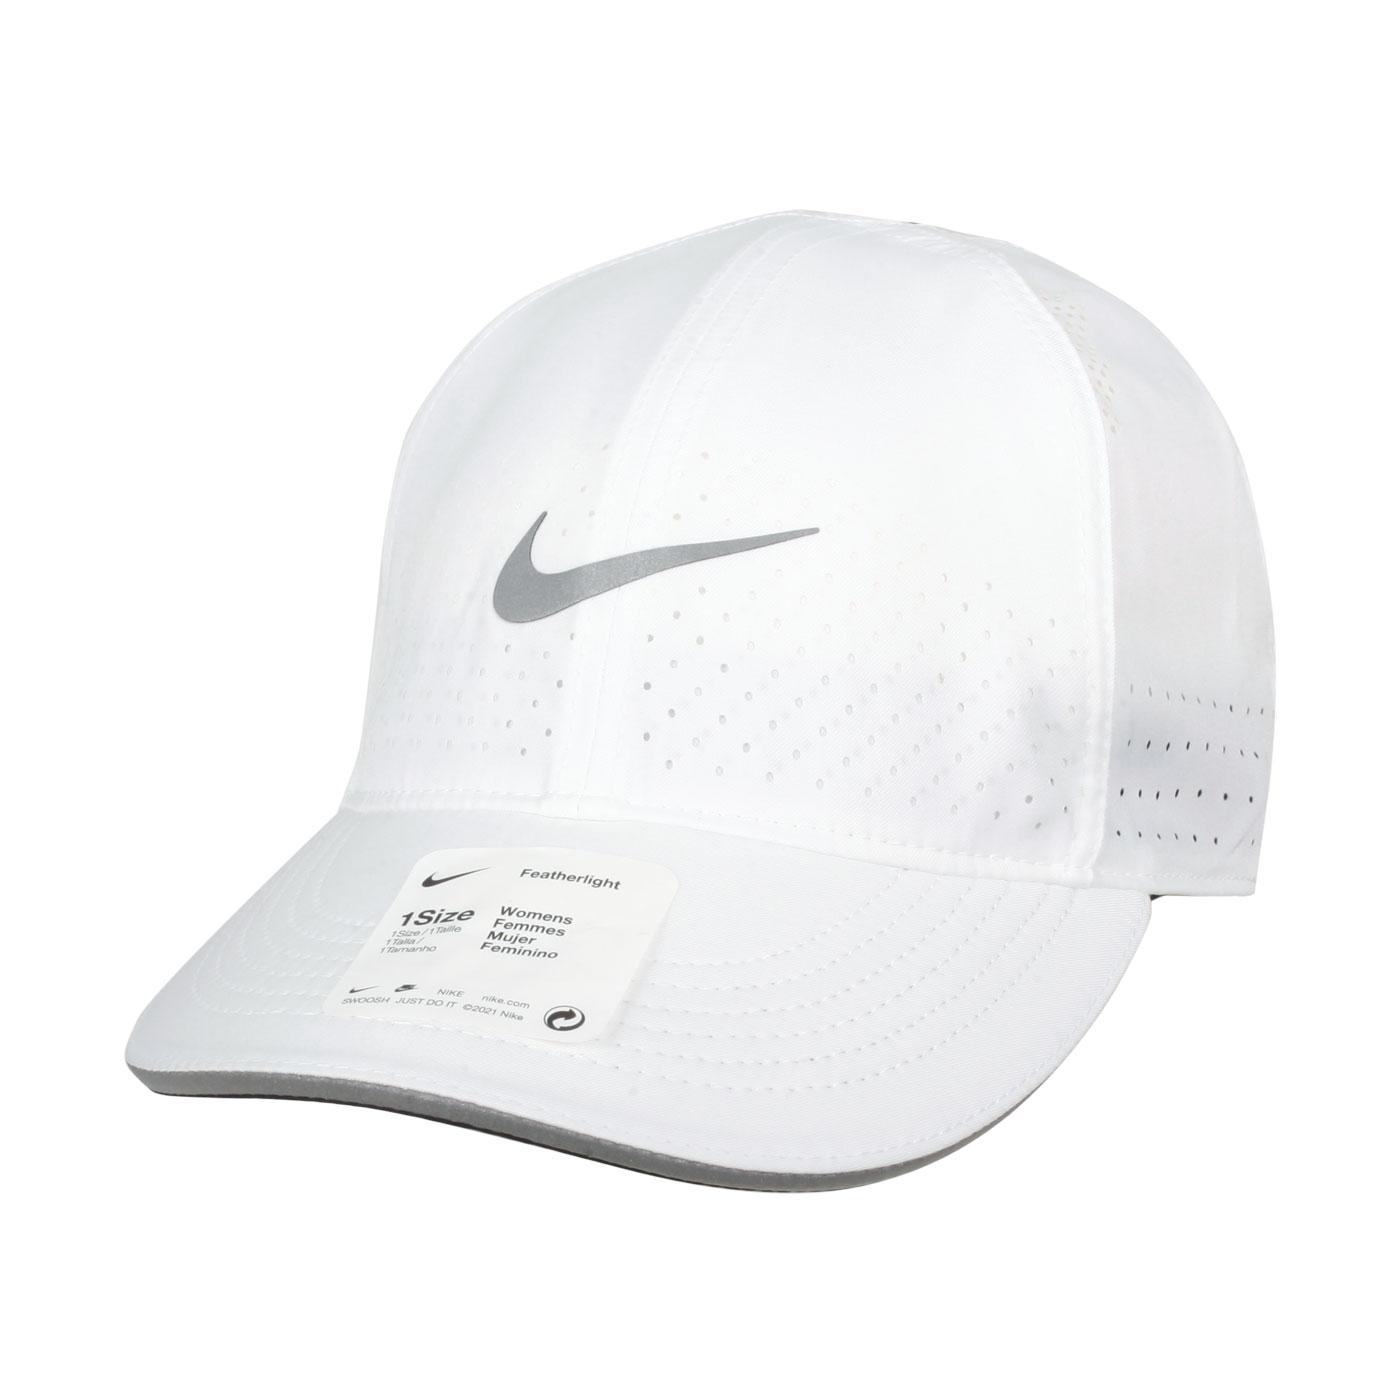 NIKE 帽子 DC4090-100 - 白灰